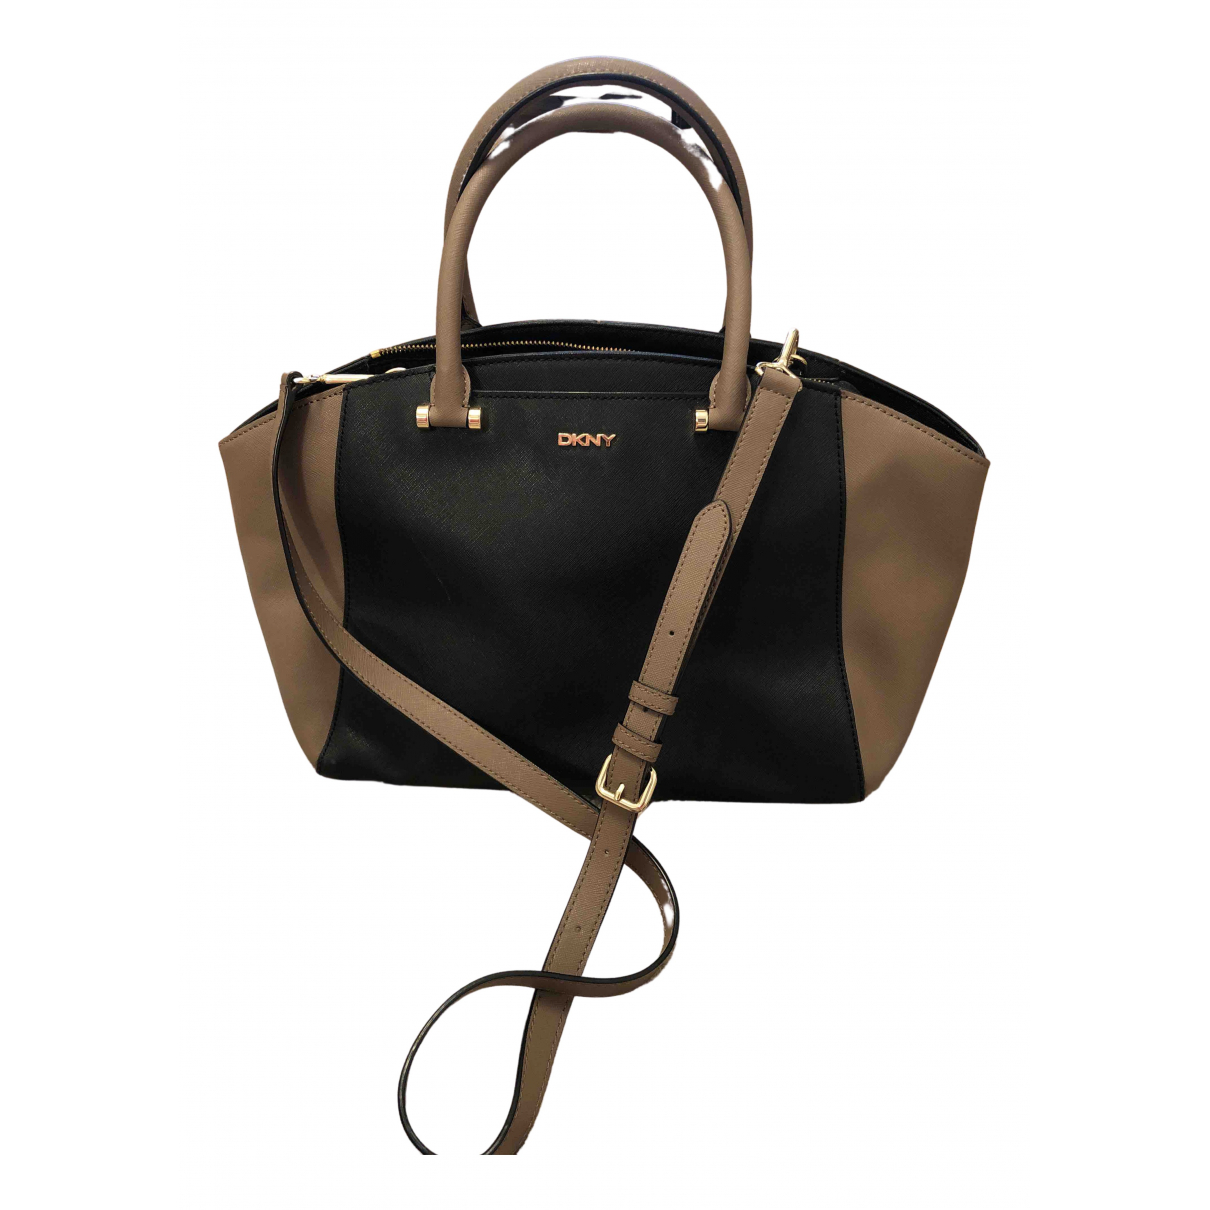 Dkny N Leather handbag for Women N